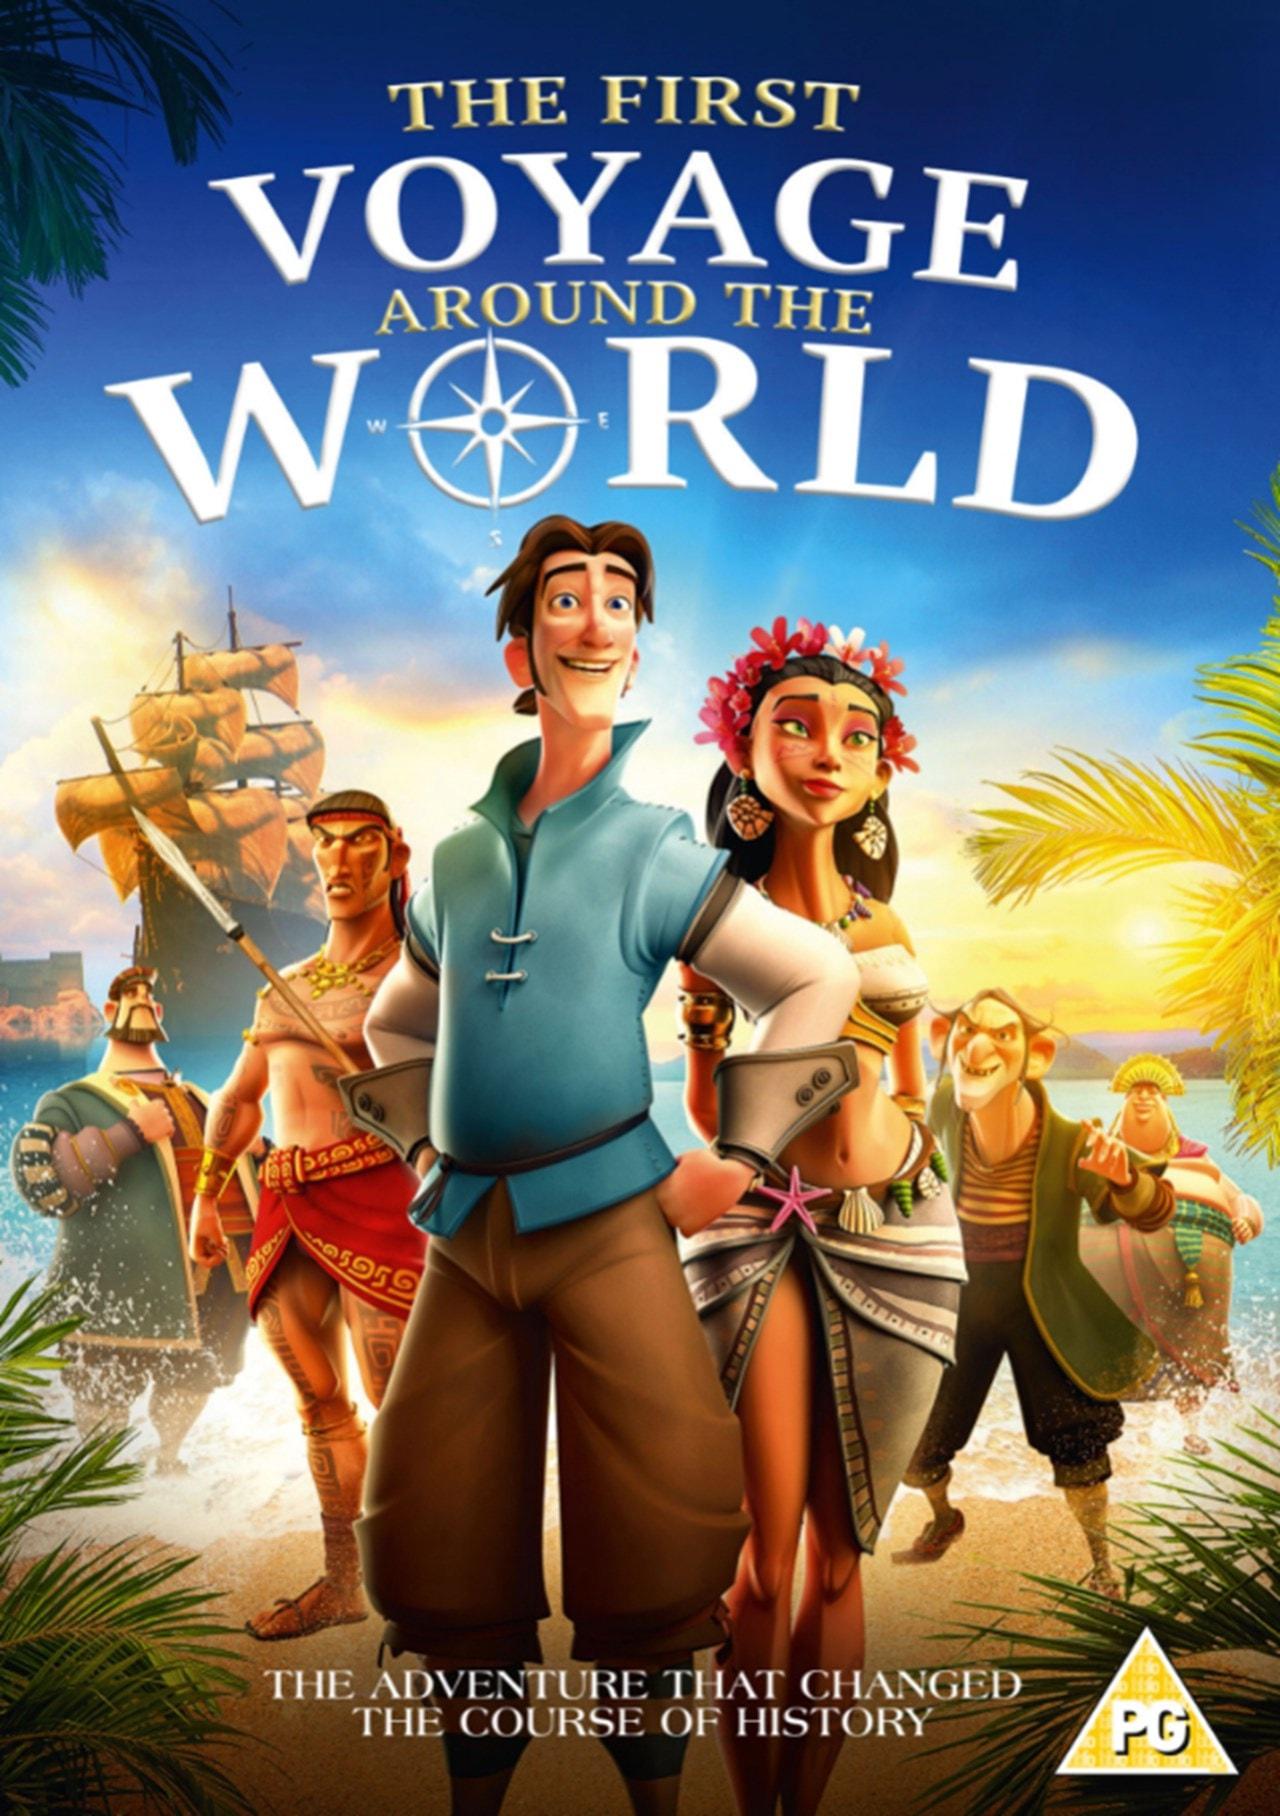 The First Voyage Around the World - 1